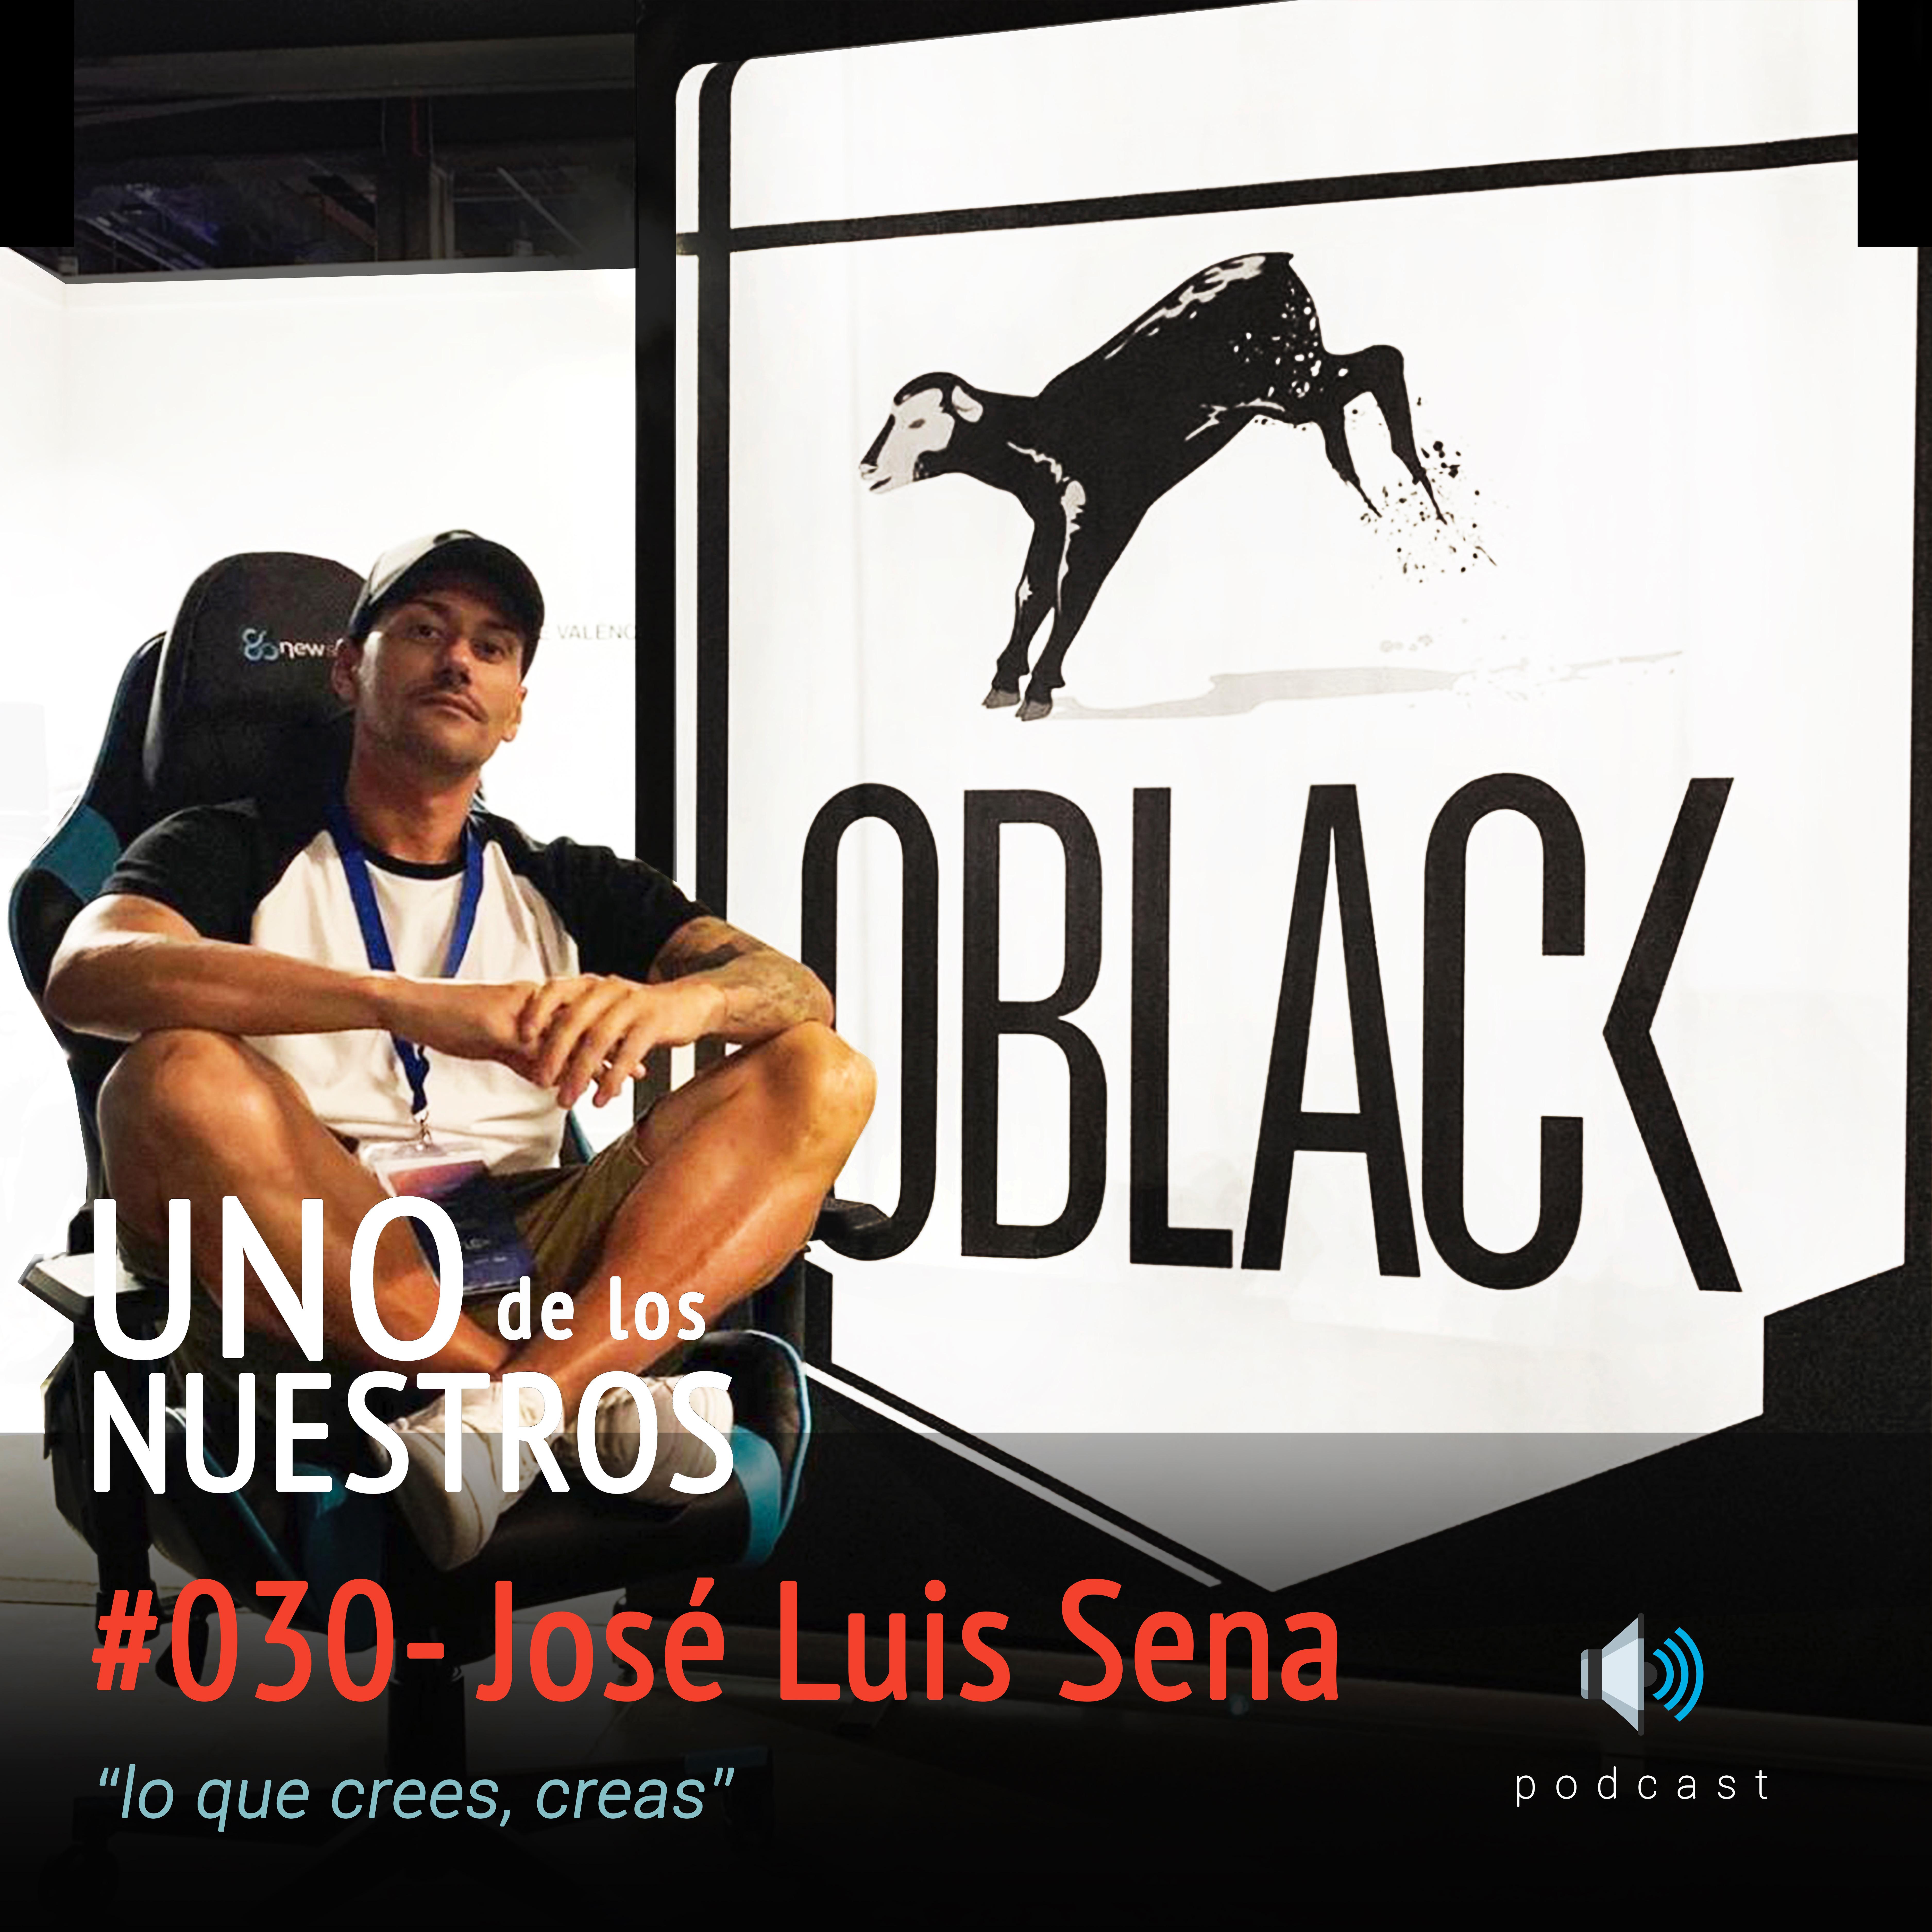 Jose Luis Sena